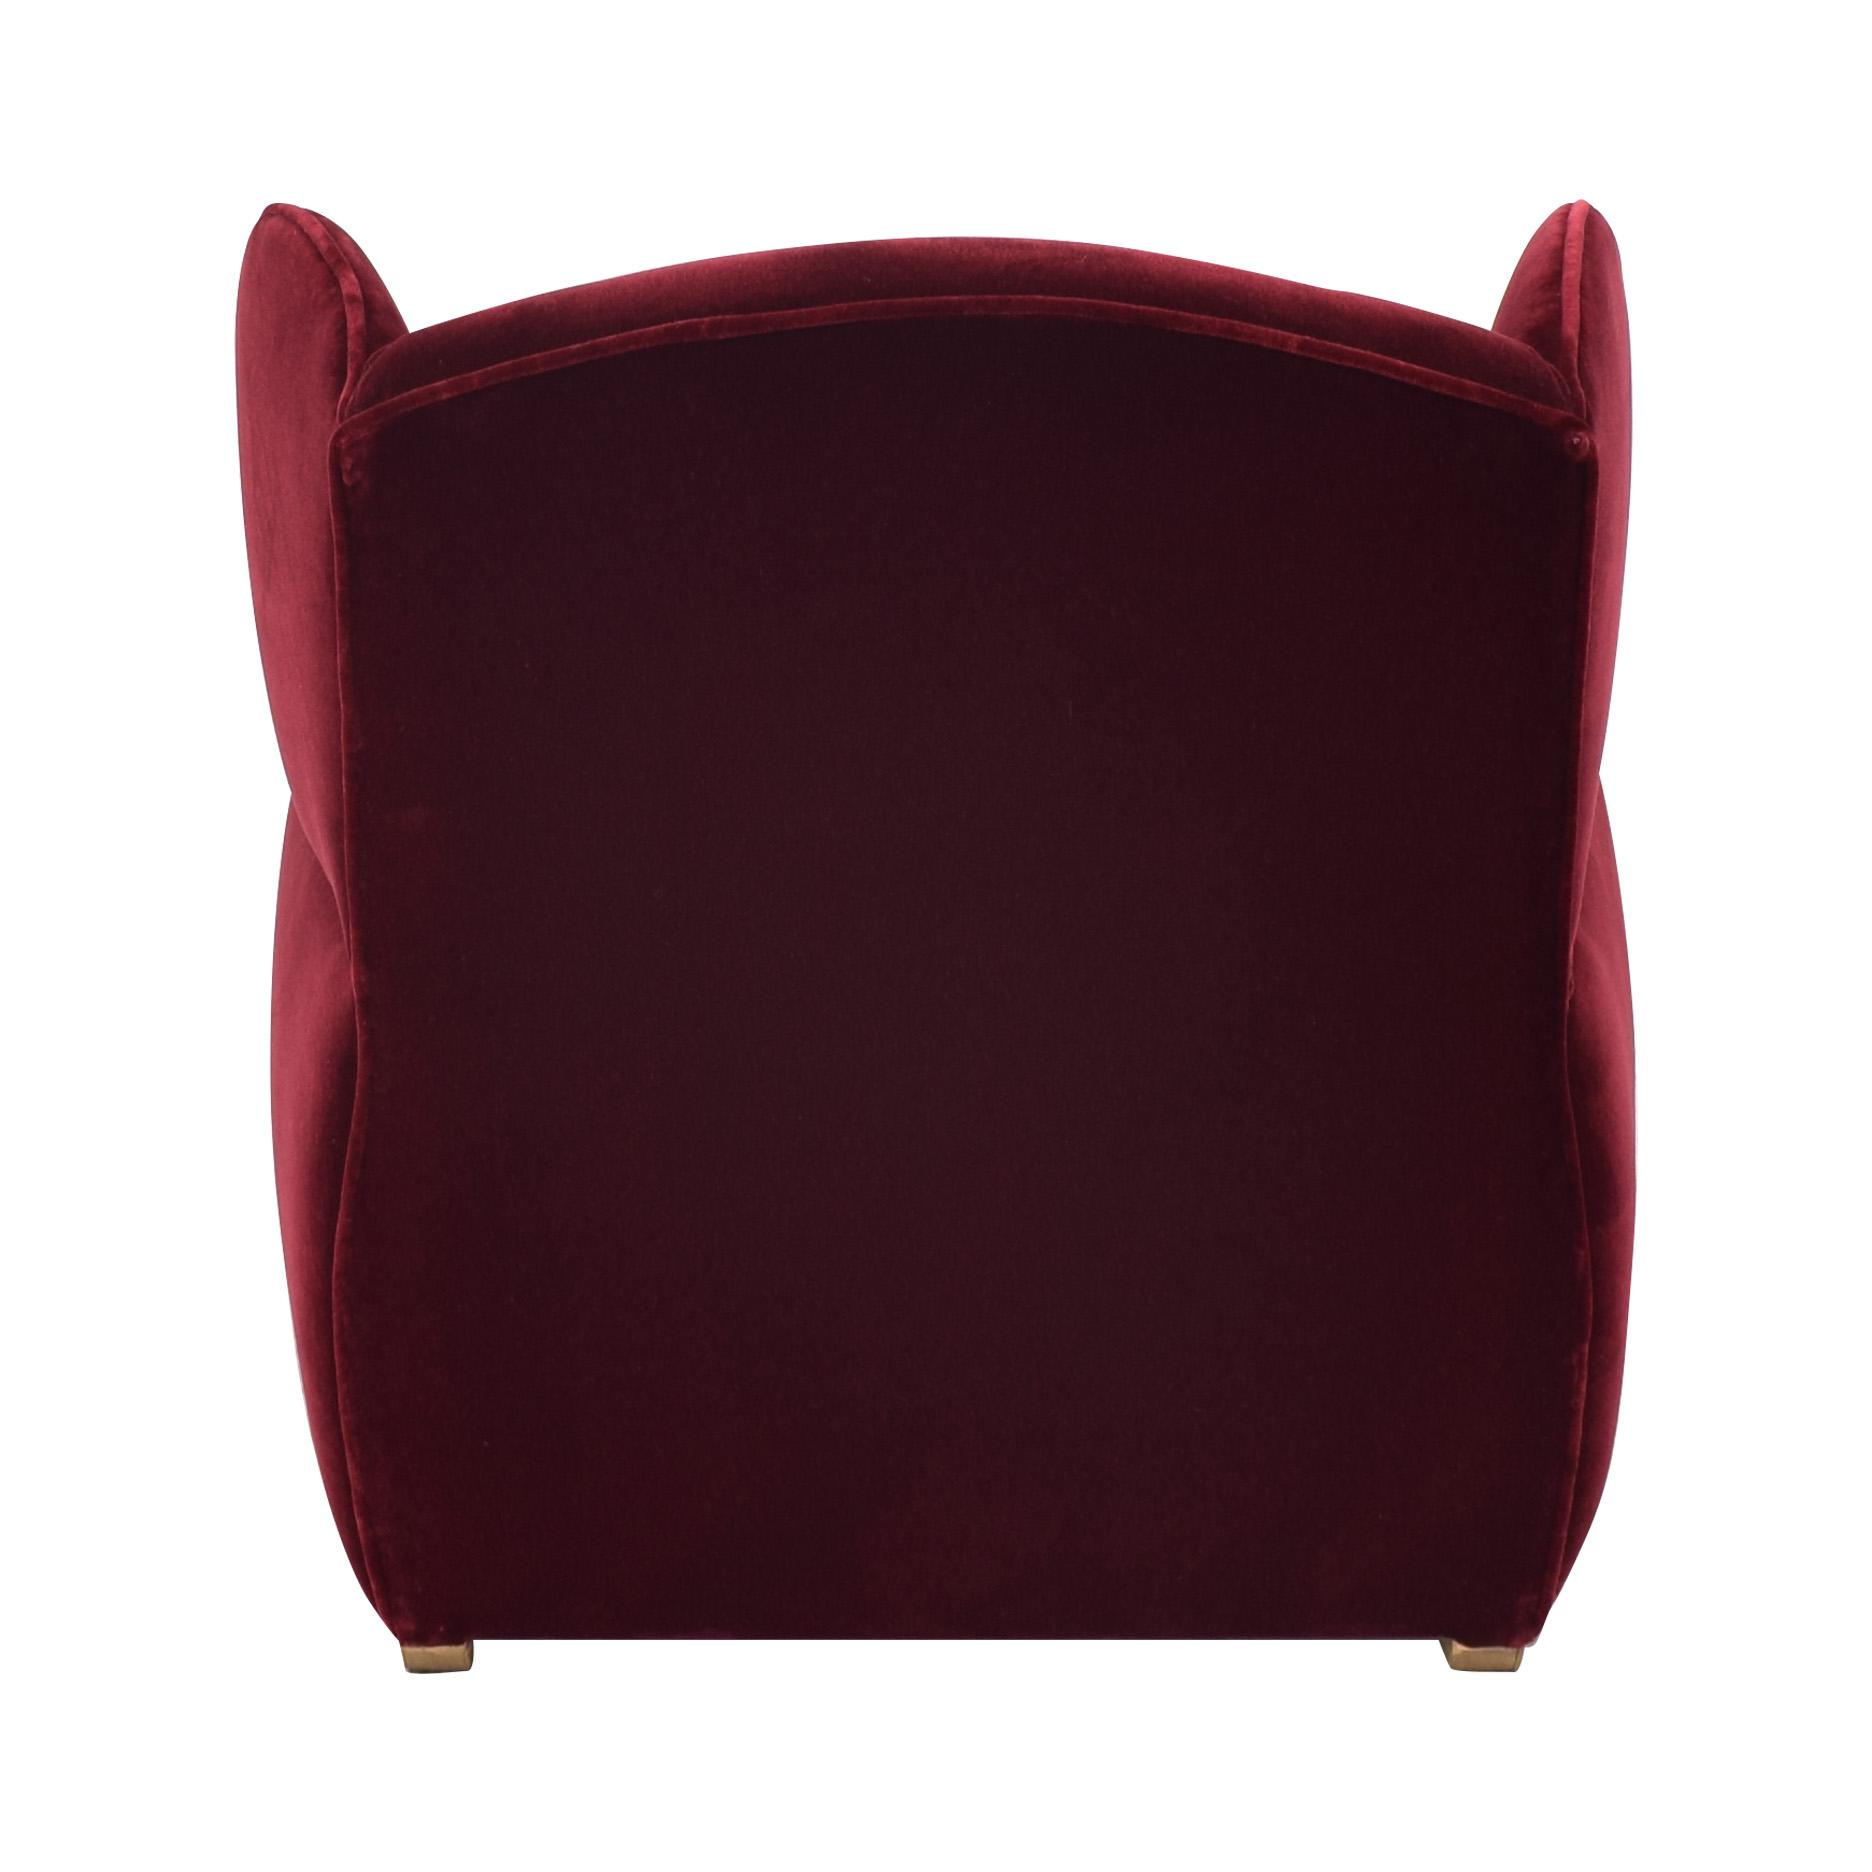 Custom Wingback Chair and Ottoman / Chairs